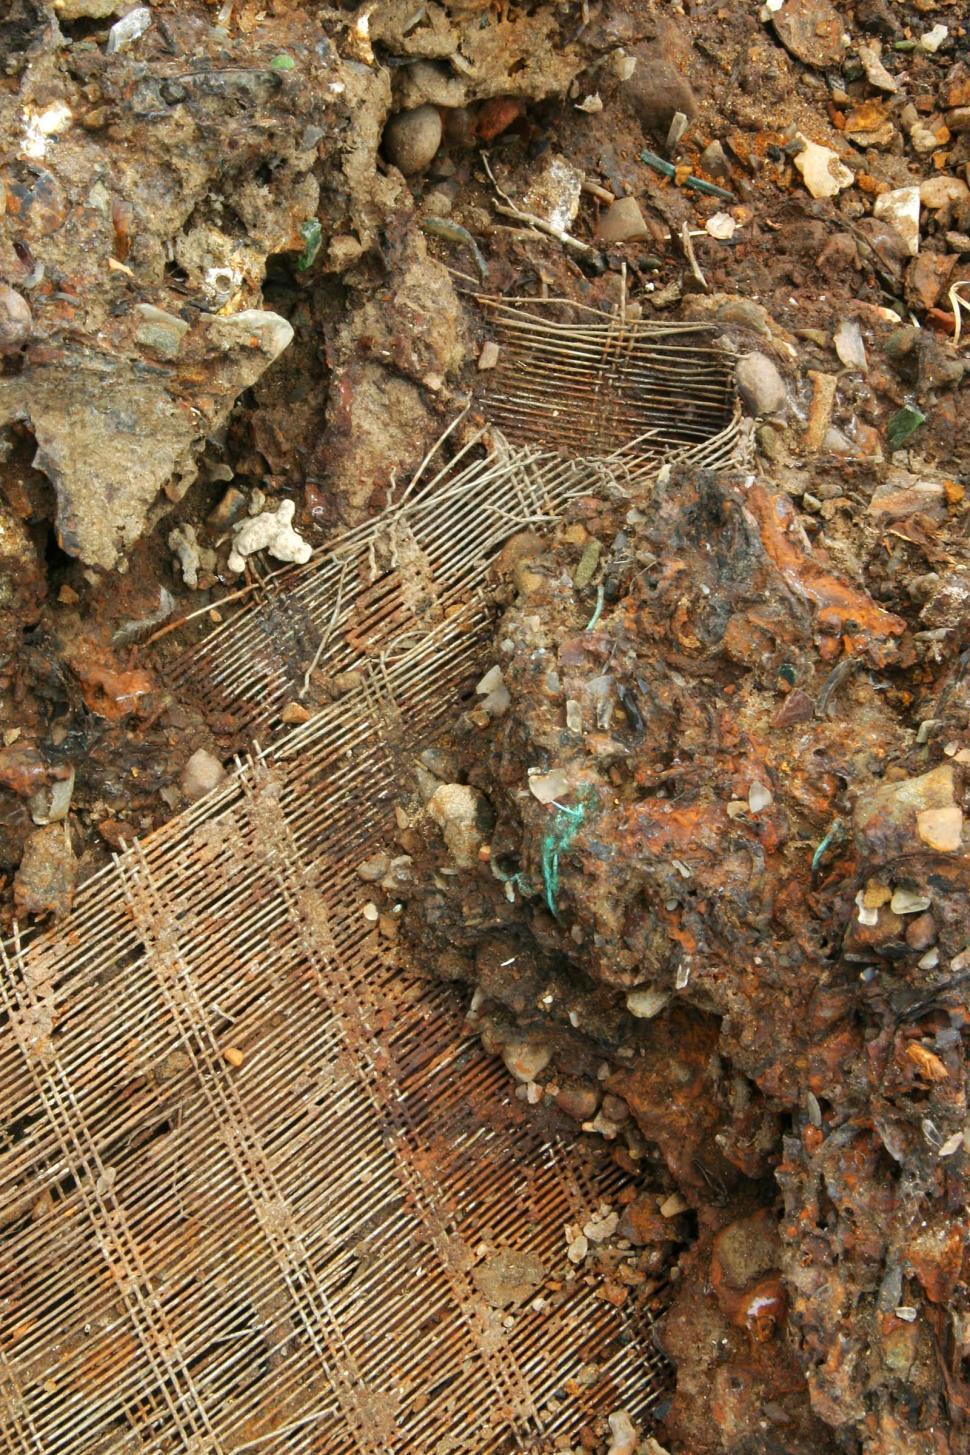 Download Free Stock HD Photo of Beach debris Online